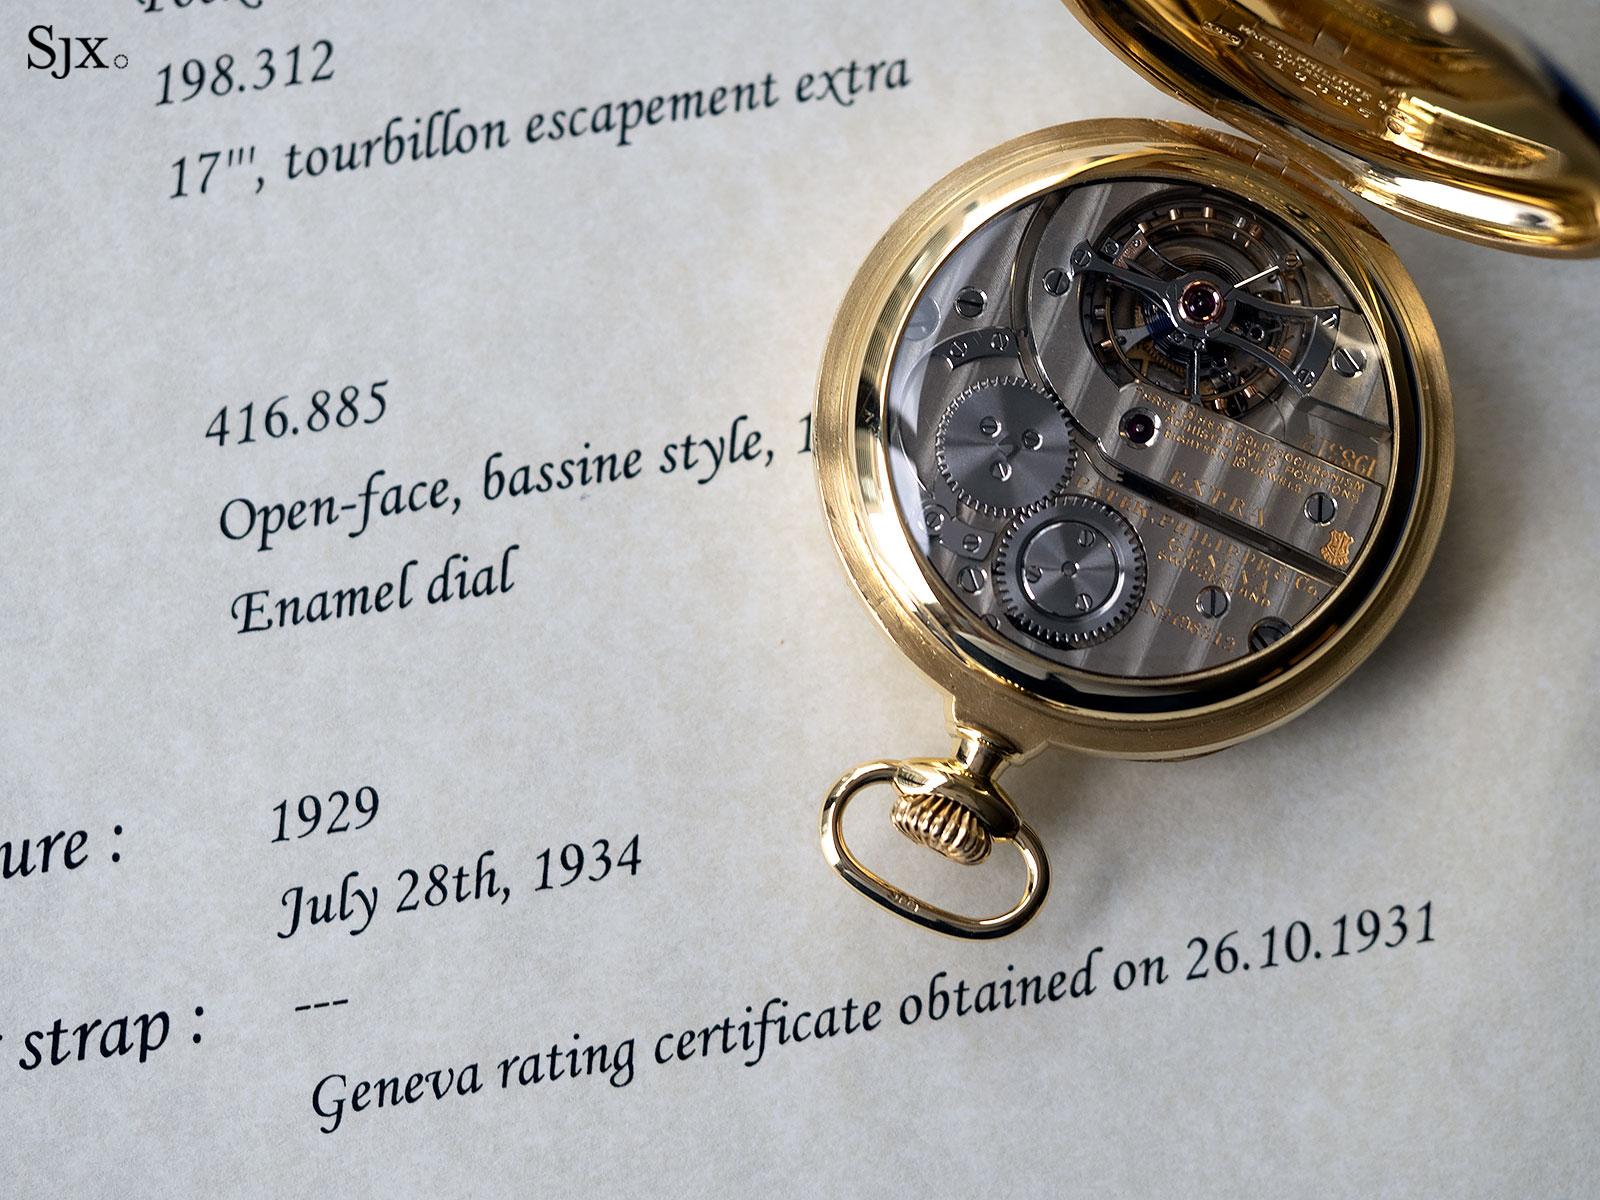 patek observatory tourbillon pocket watch 198312 23